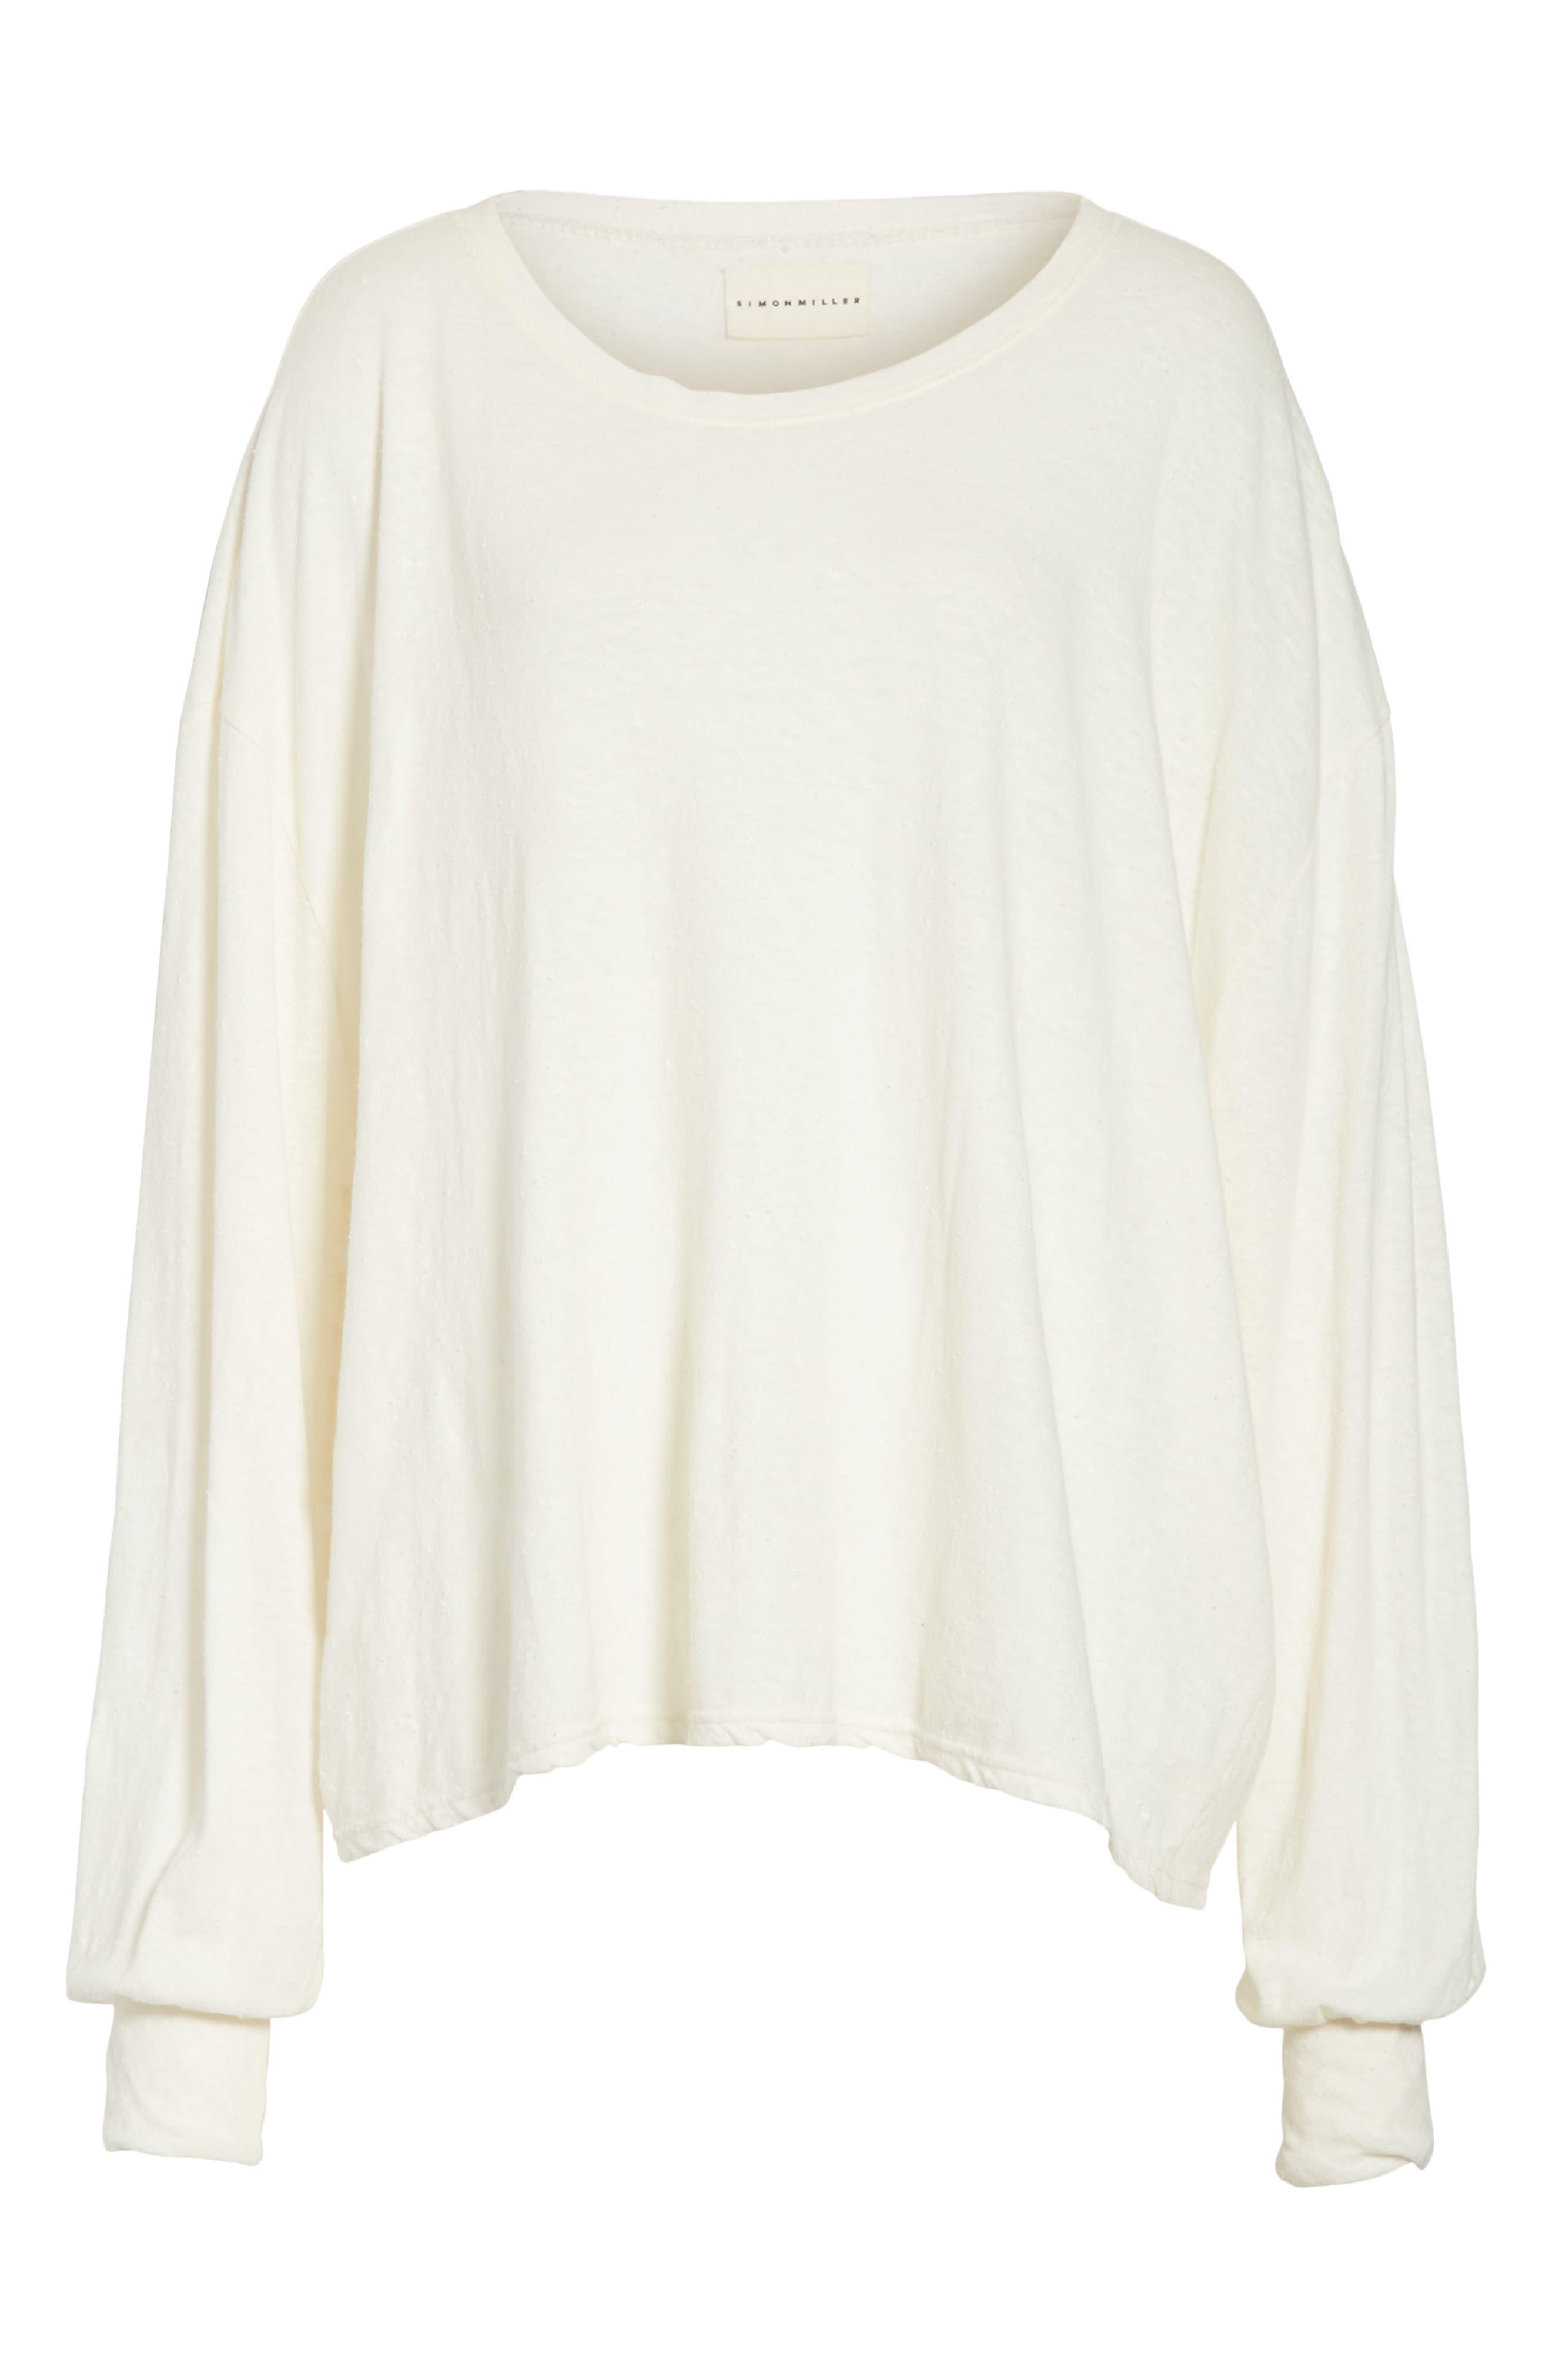 Solano Oversize Cotton Top,                             Alternate thumbnail 6, color,                             White